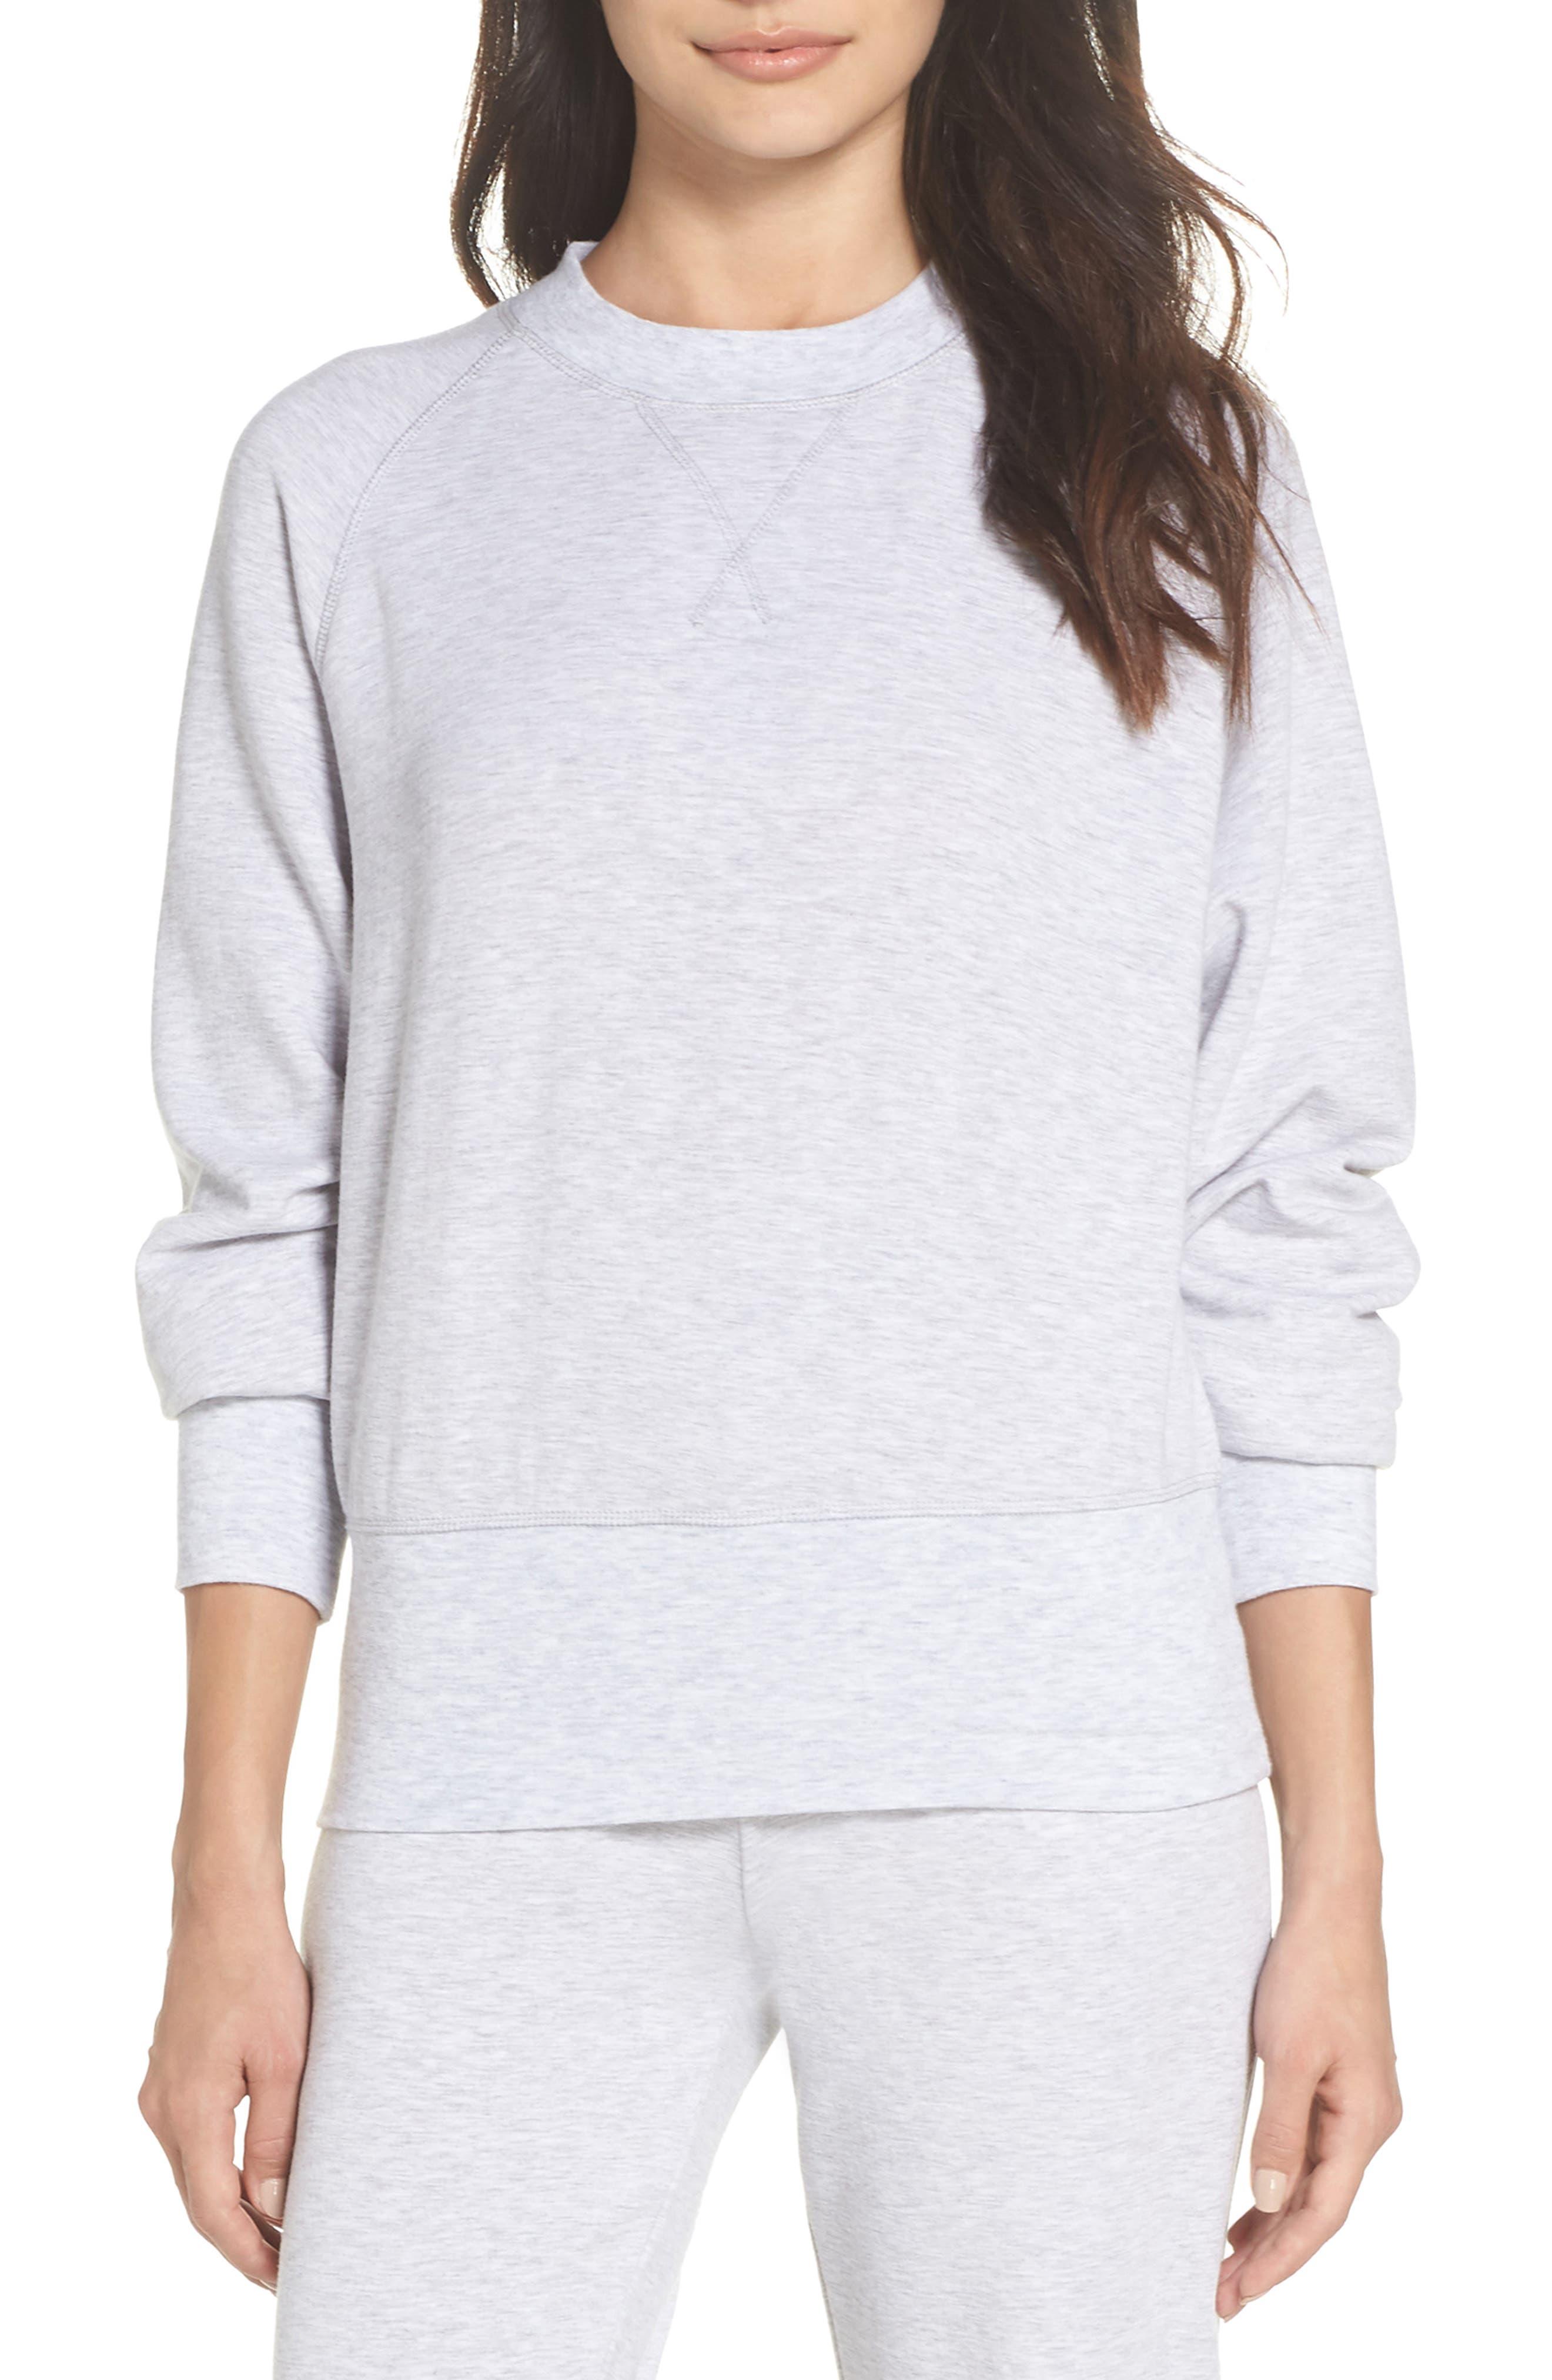 Cool Touch Sweatshirt,                             Main thumbnail 1, color,                             020